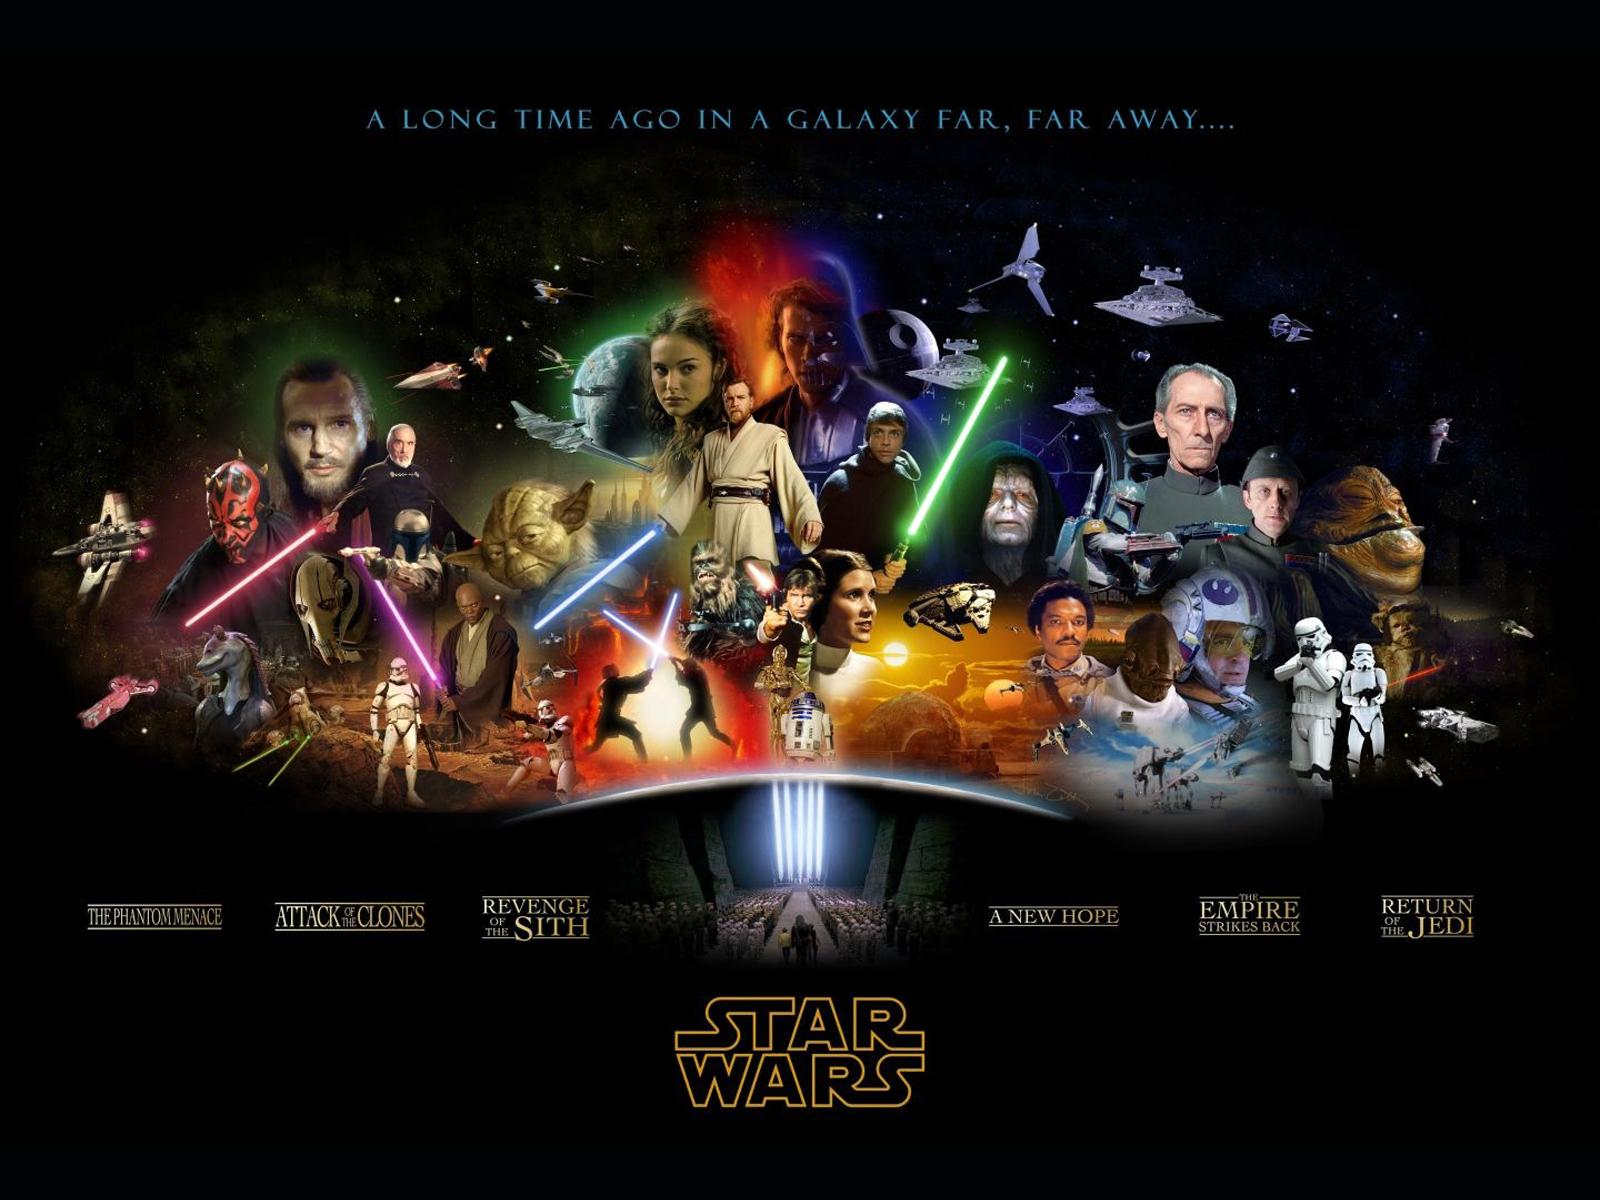 page size 1600x1200 desktop wallpaper of star wars day 1600x1200